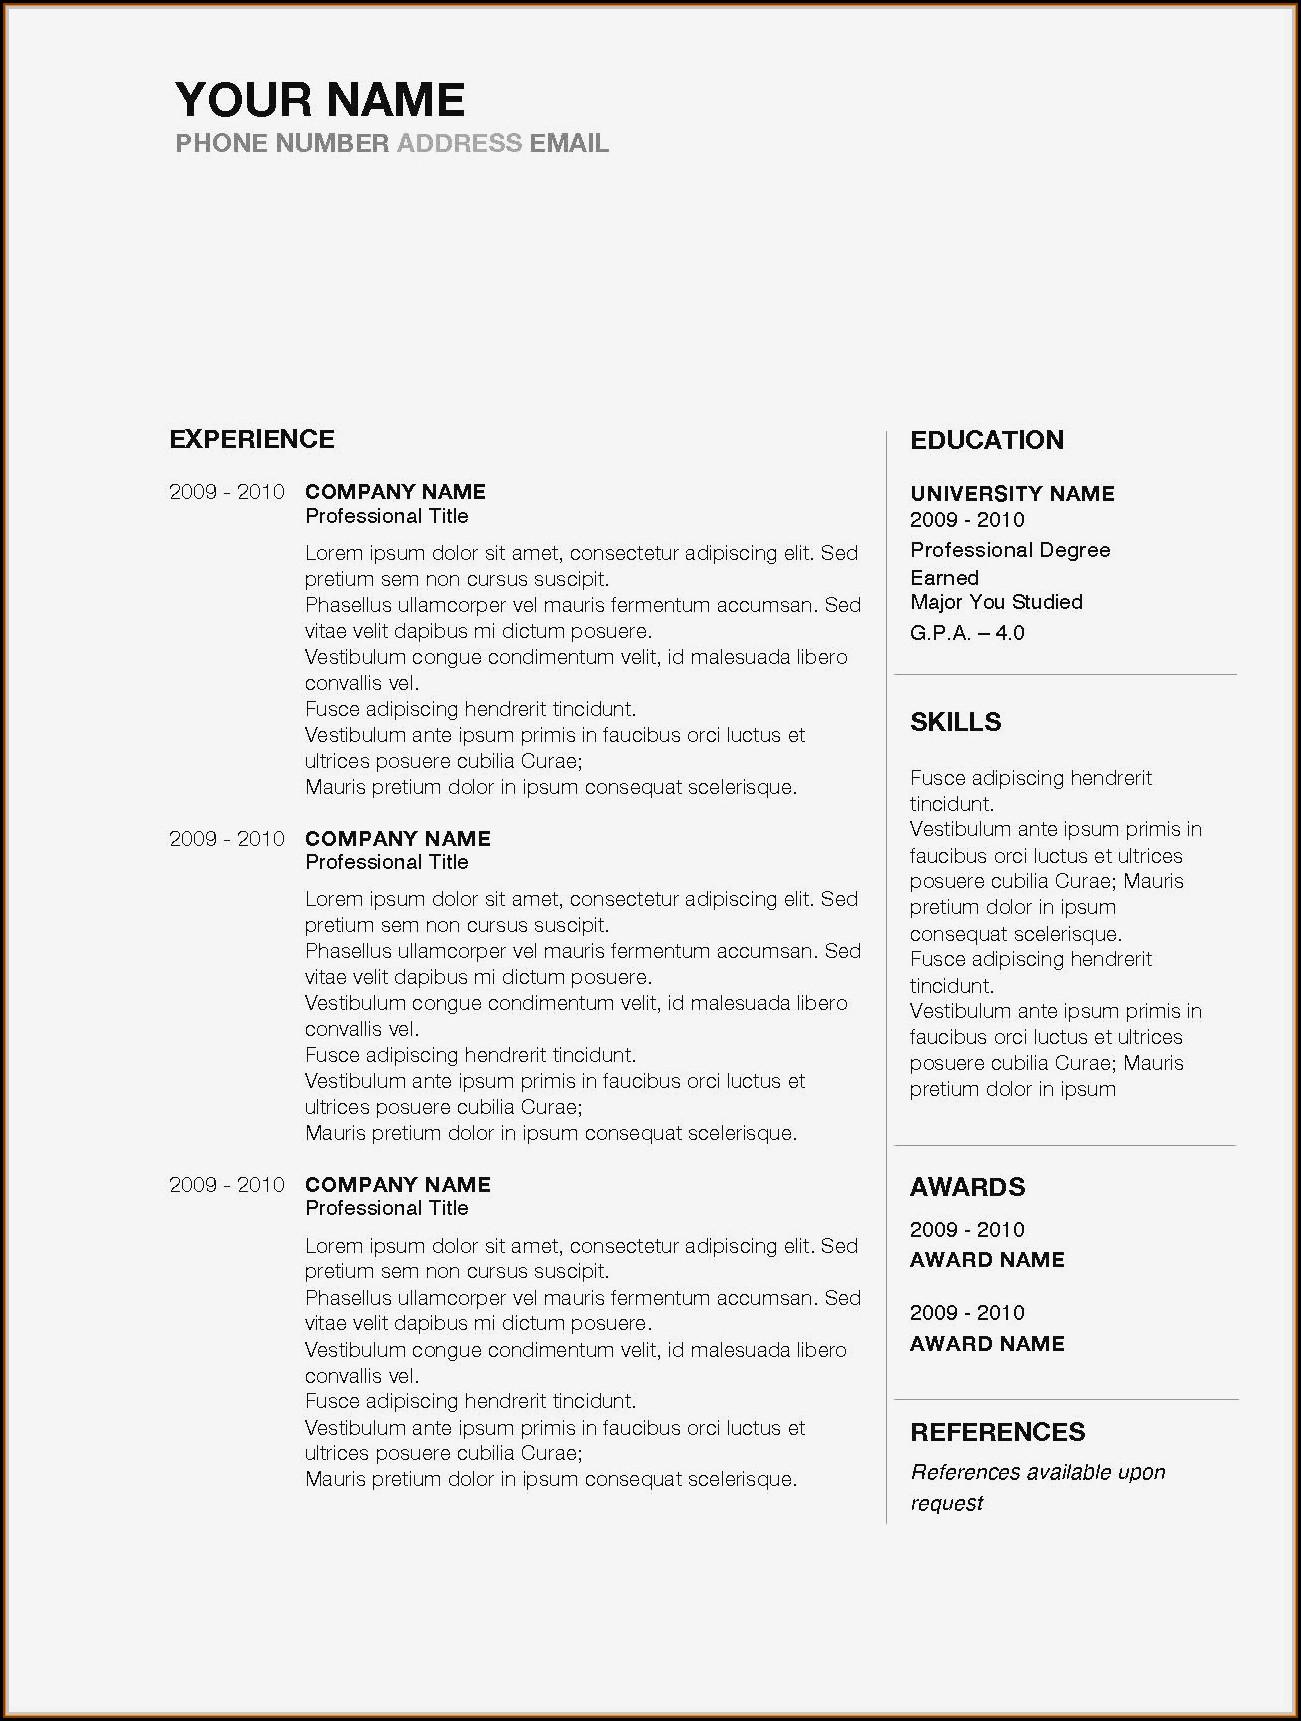 Free Sample Resume Download In Word Format